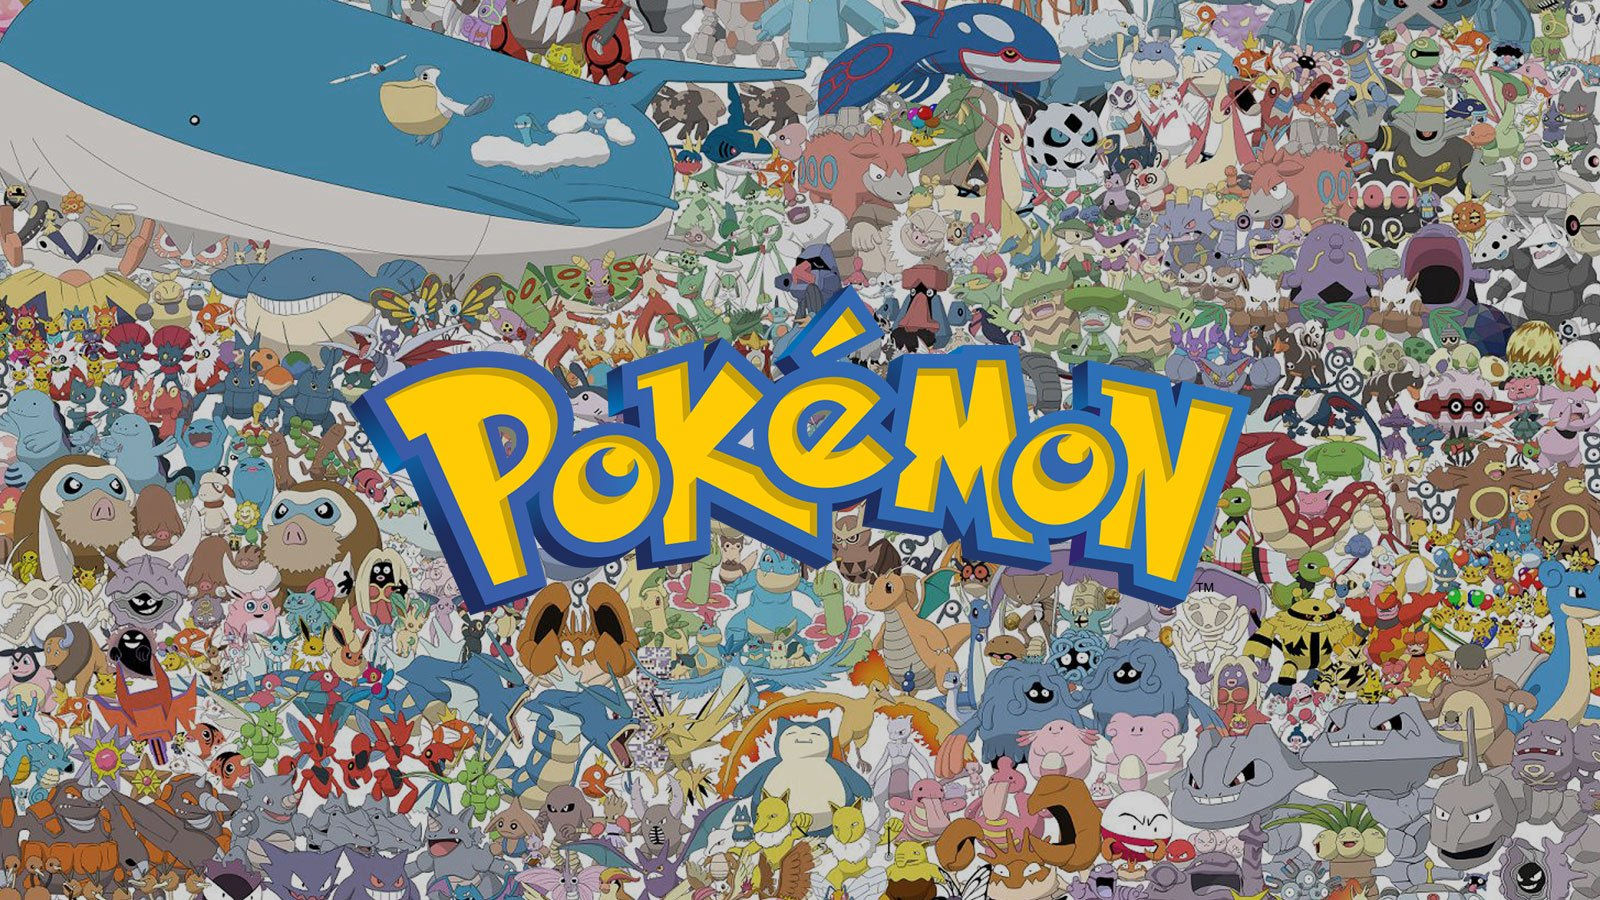 Un artiste dévoile son titanesque dessin Pokémon